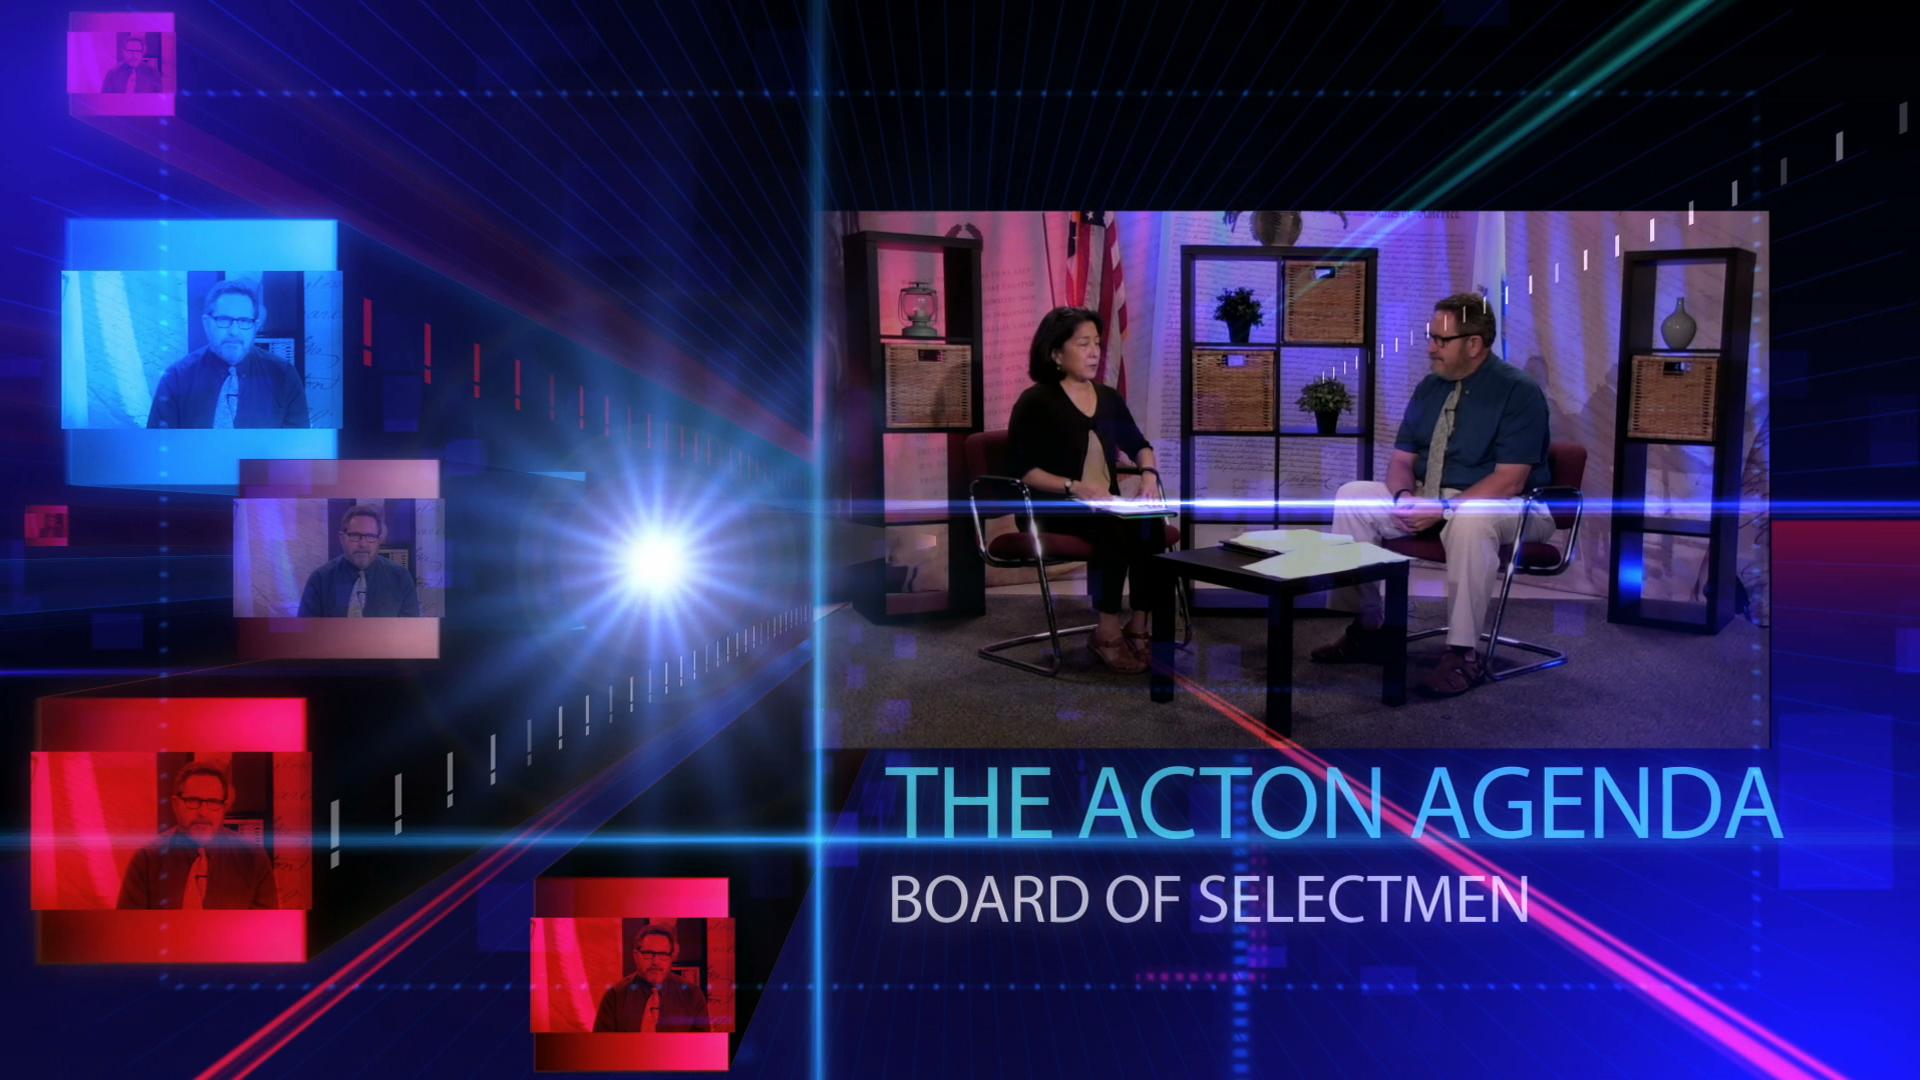 The Acton Agenda